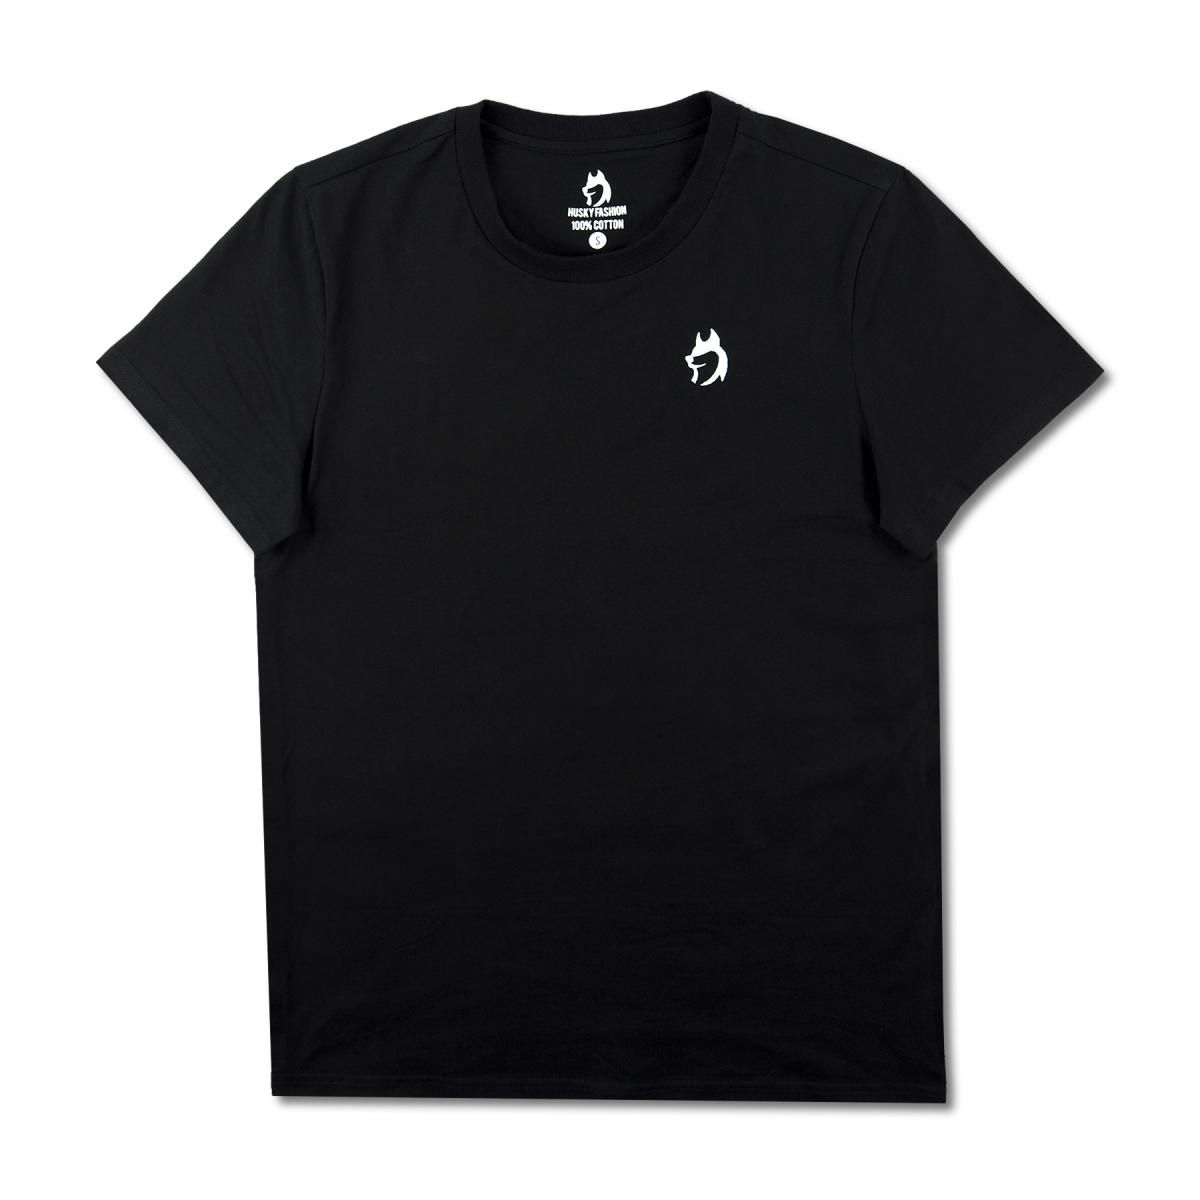 "Husky T-Shirt ""Generation II"" - Front"